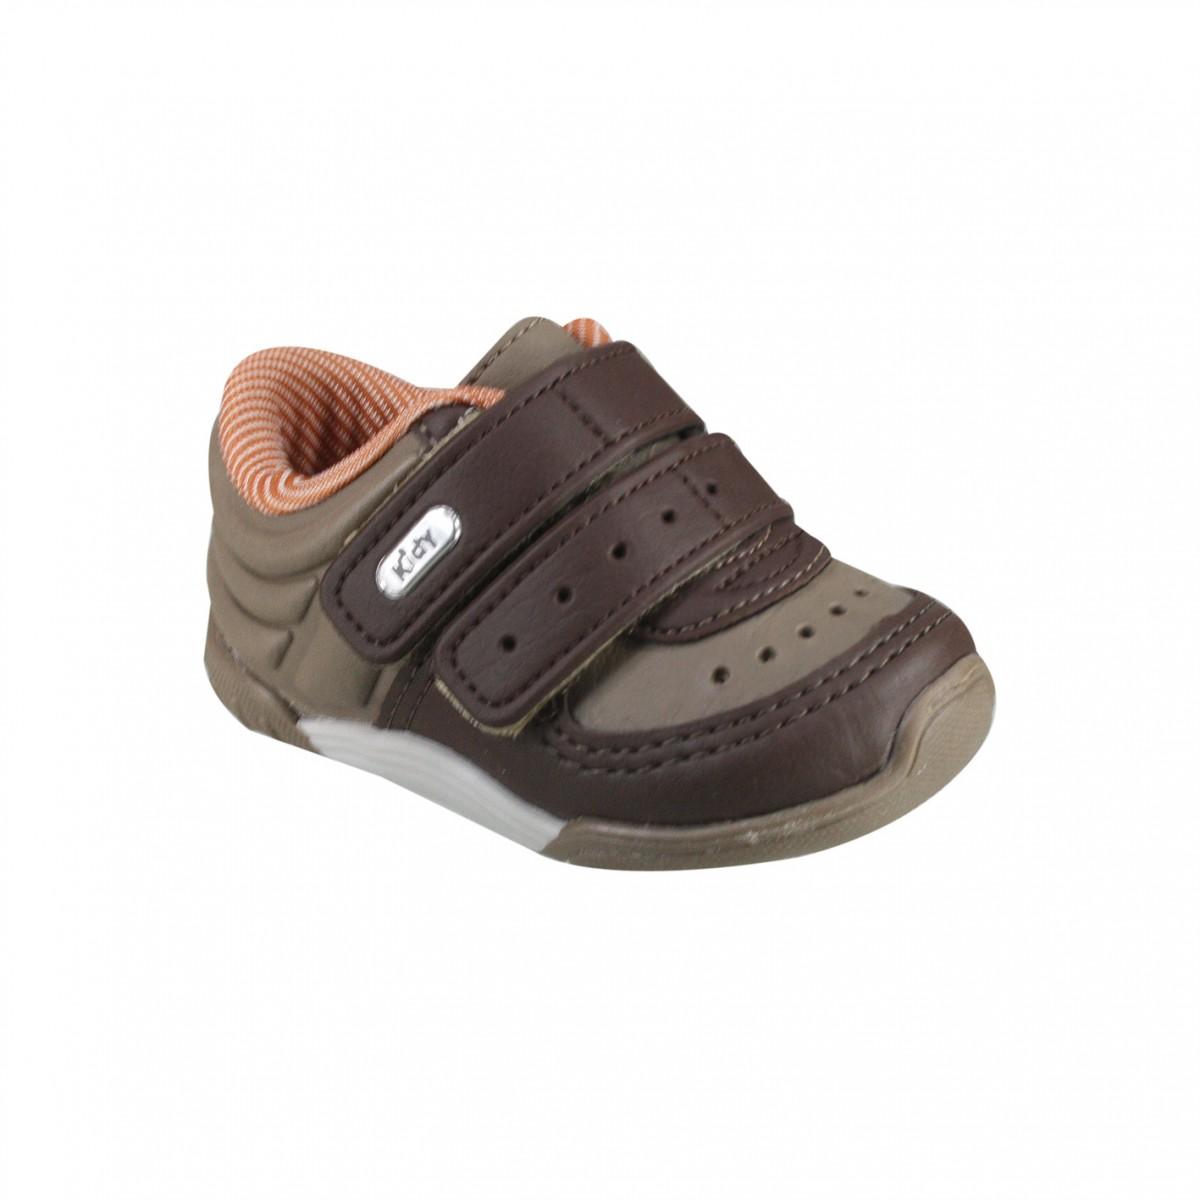 Tênis Infantil Kidy Colors 008-0386-4502 Castanho Marrom Ocre 350bbff510592